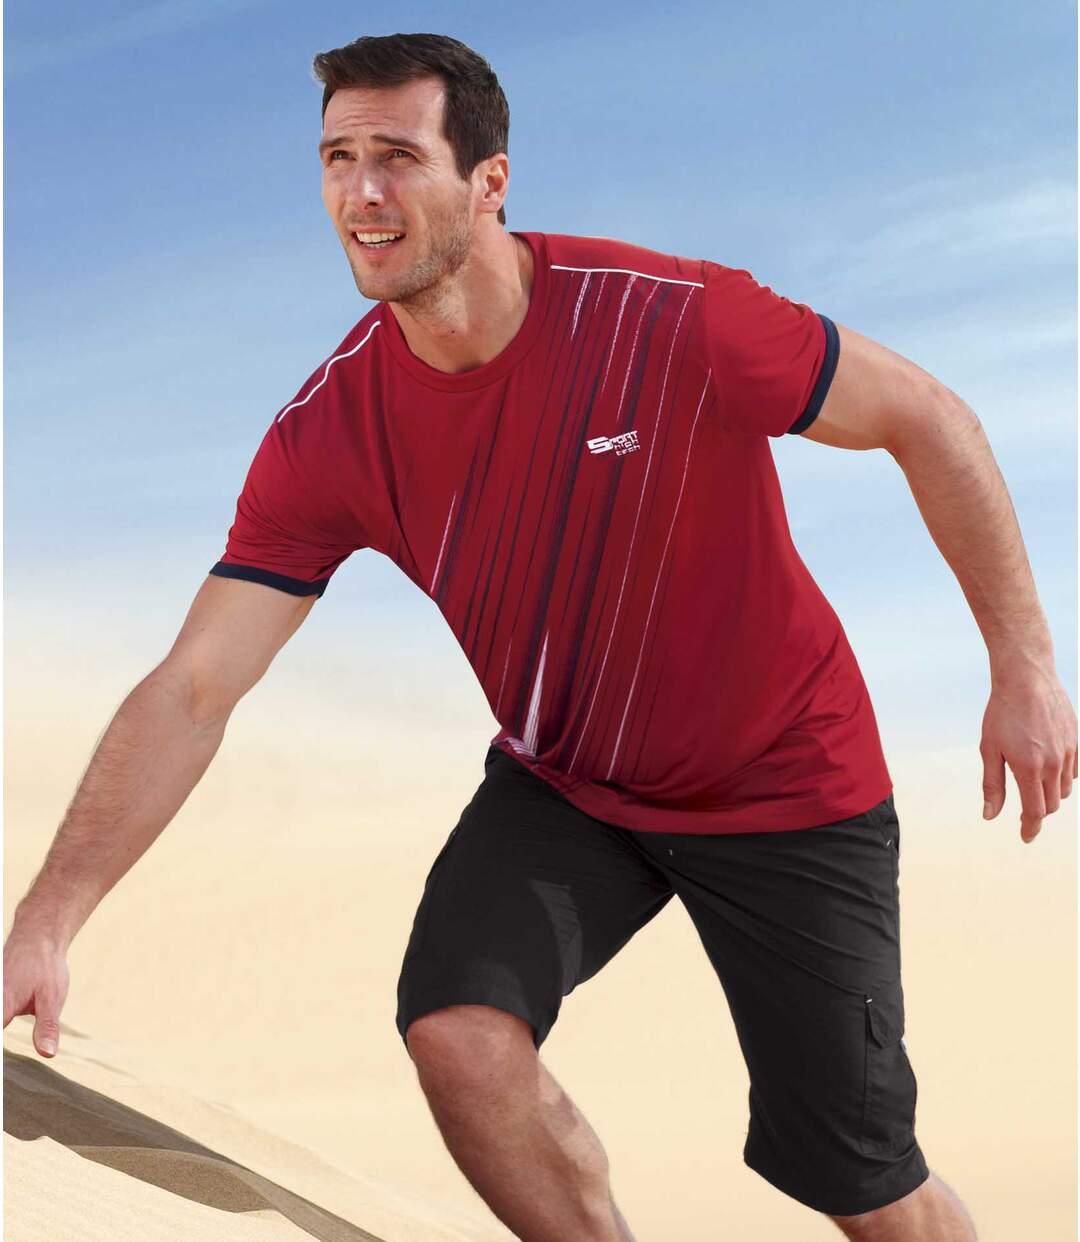 Pack of 3 Men's Summer Sport T-Shirts - White Red Black